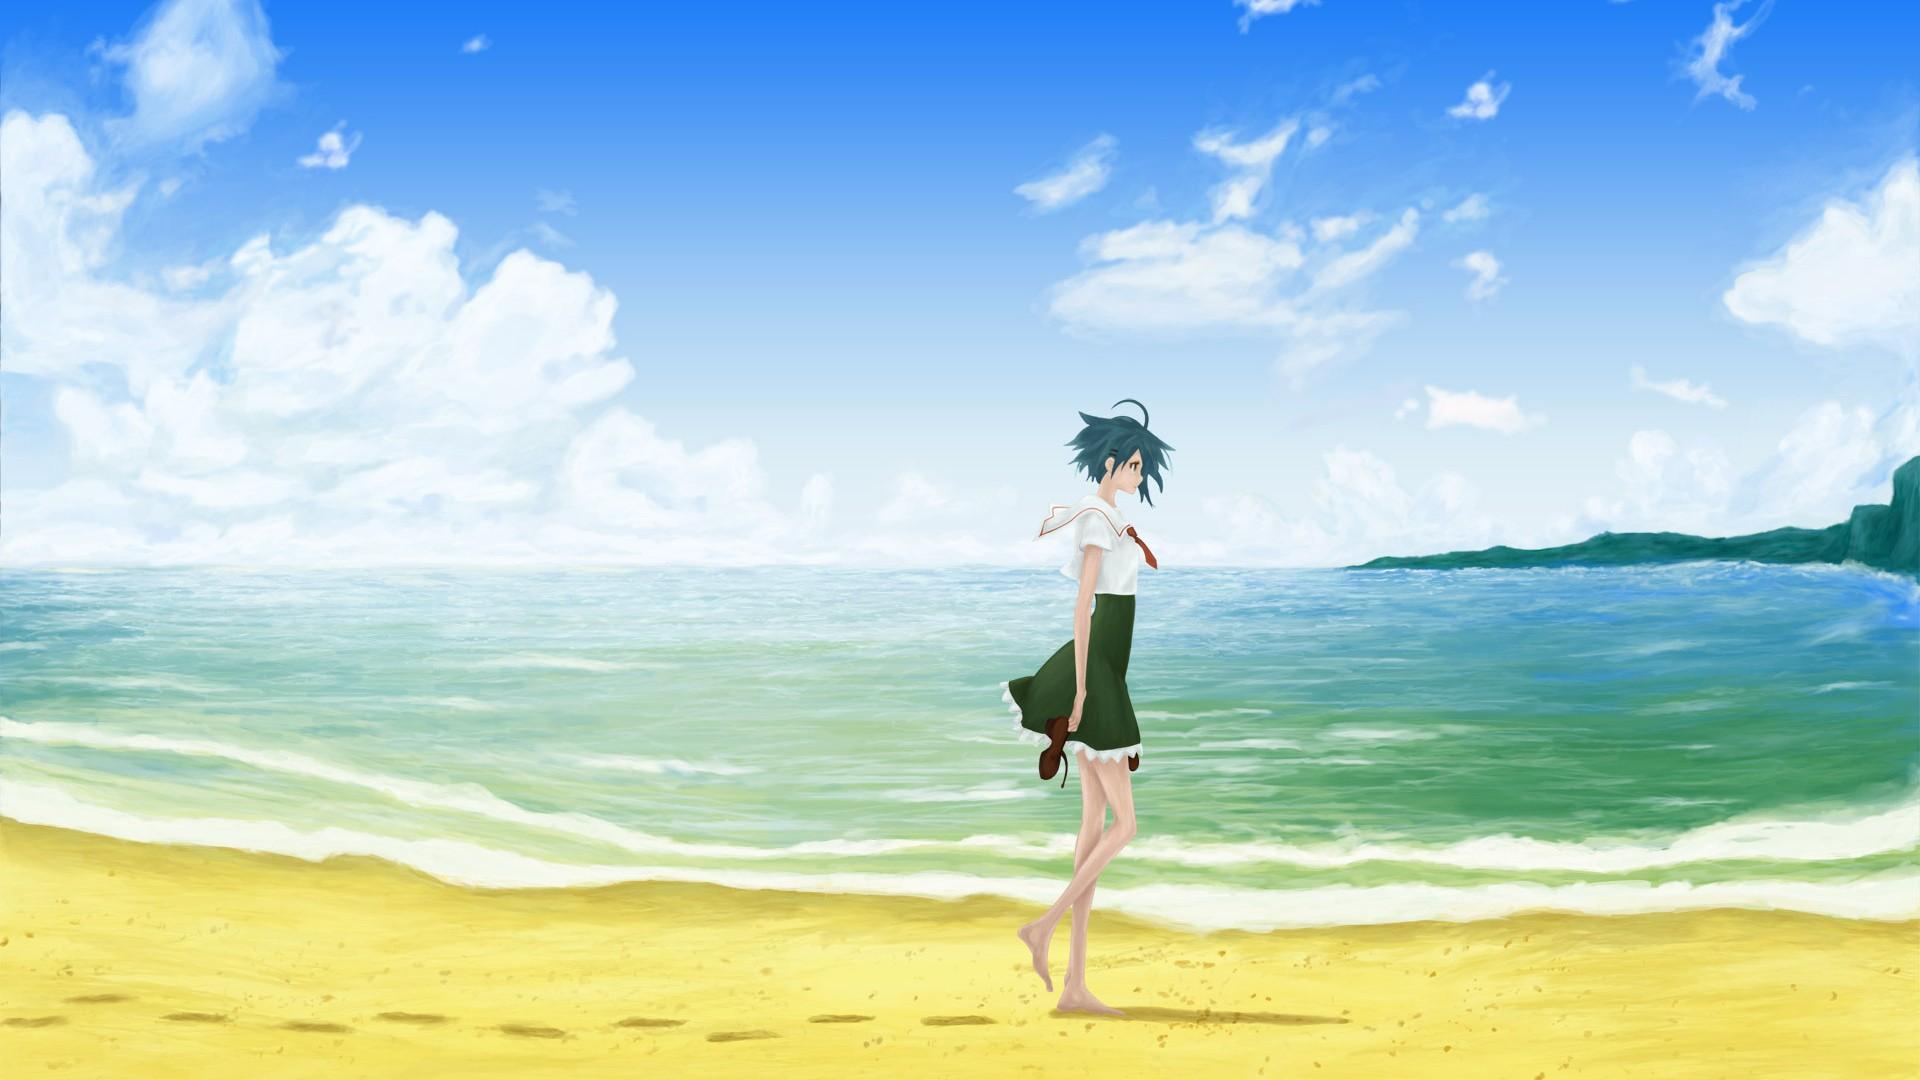 Anime Beach wallpaper for pc